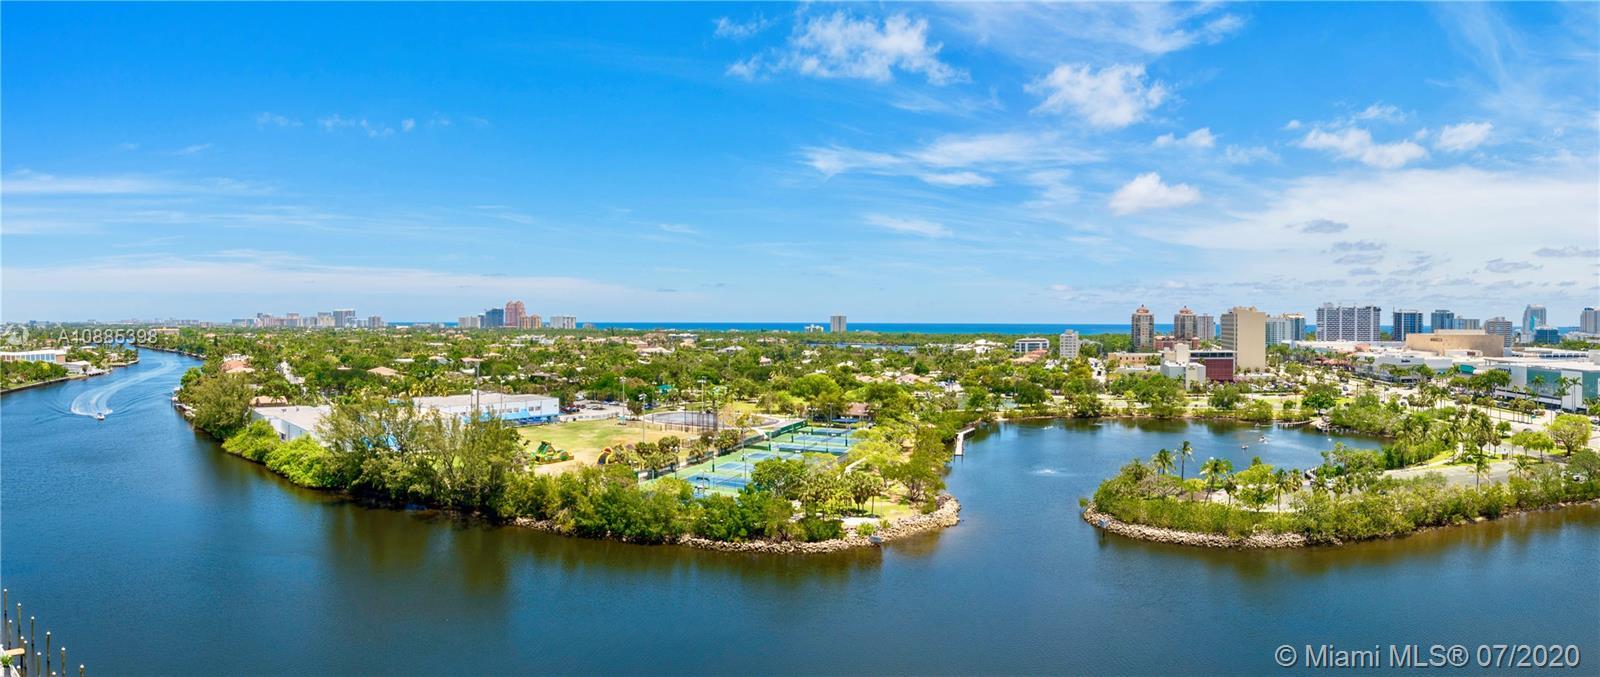 Riva Fort Lauderdale #1510 - 1180 N Federal Hwy #1510, Fort Lauderdale, FL 33304